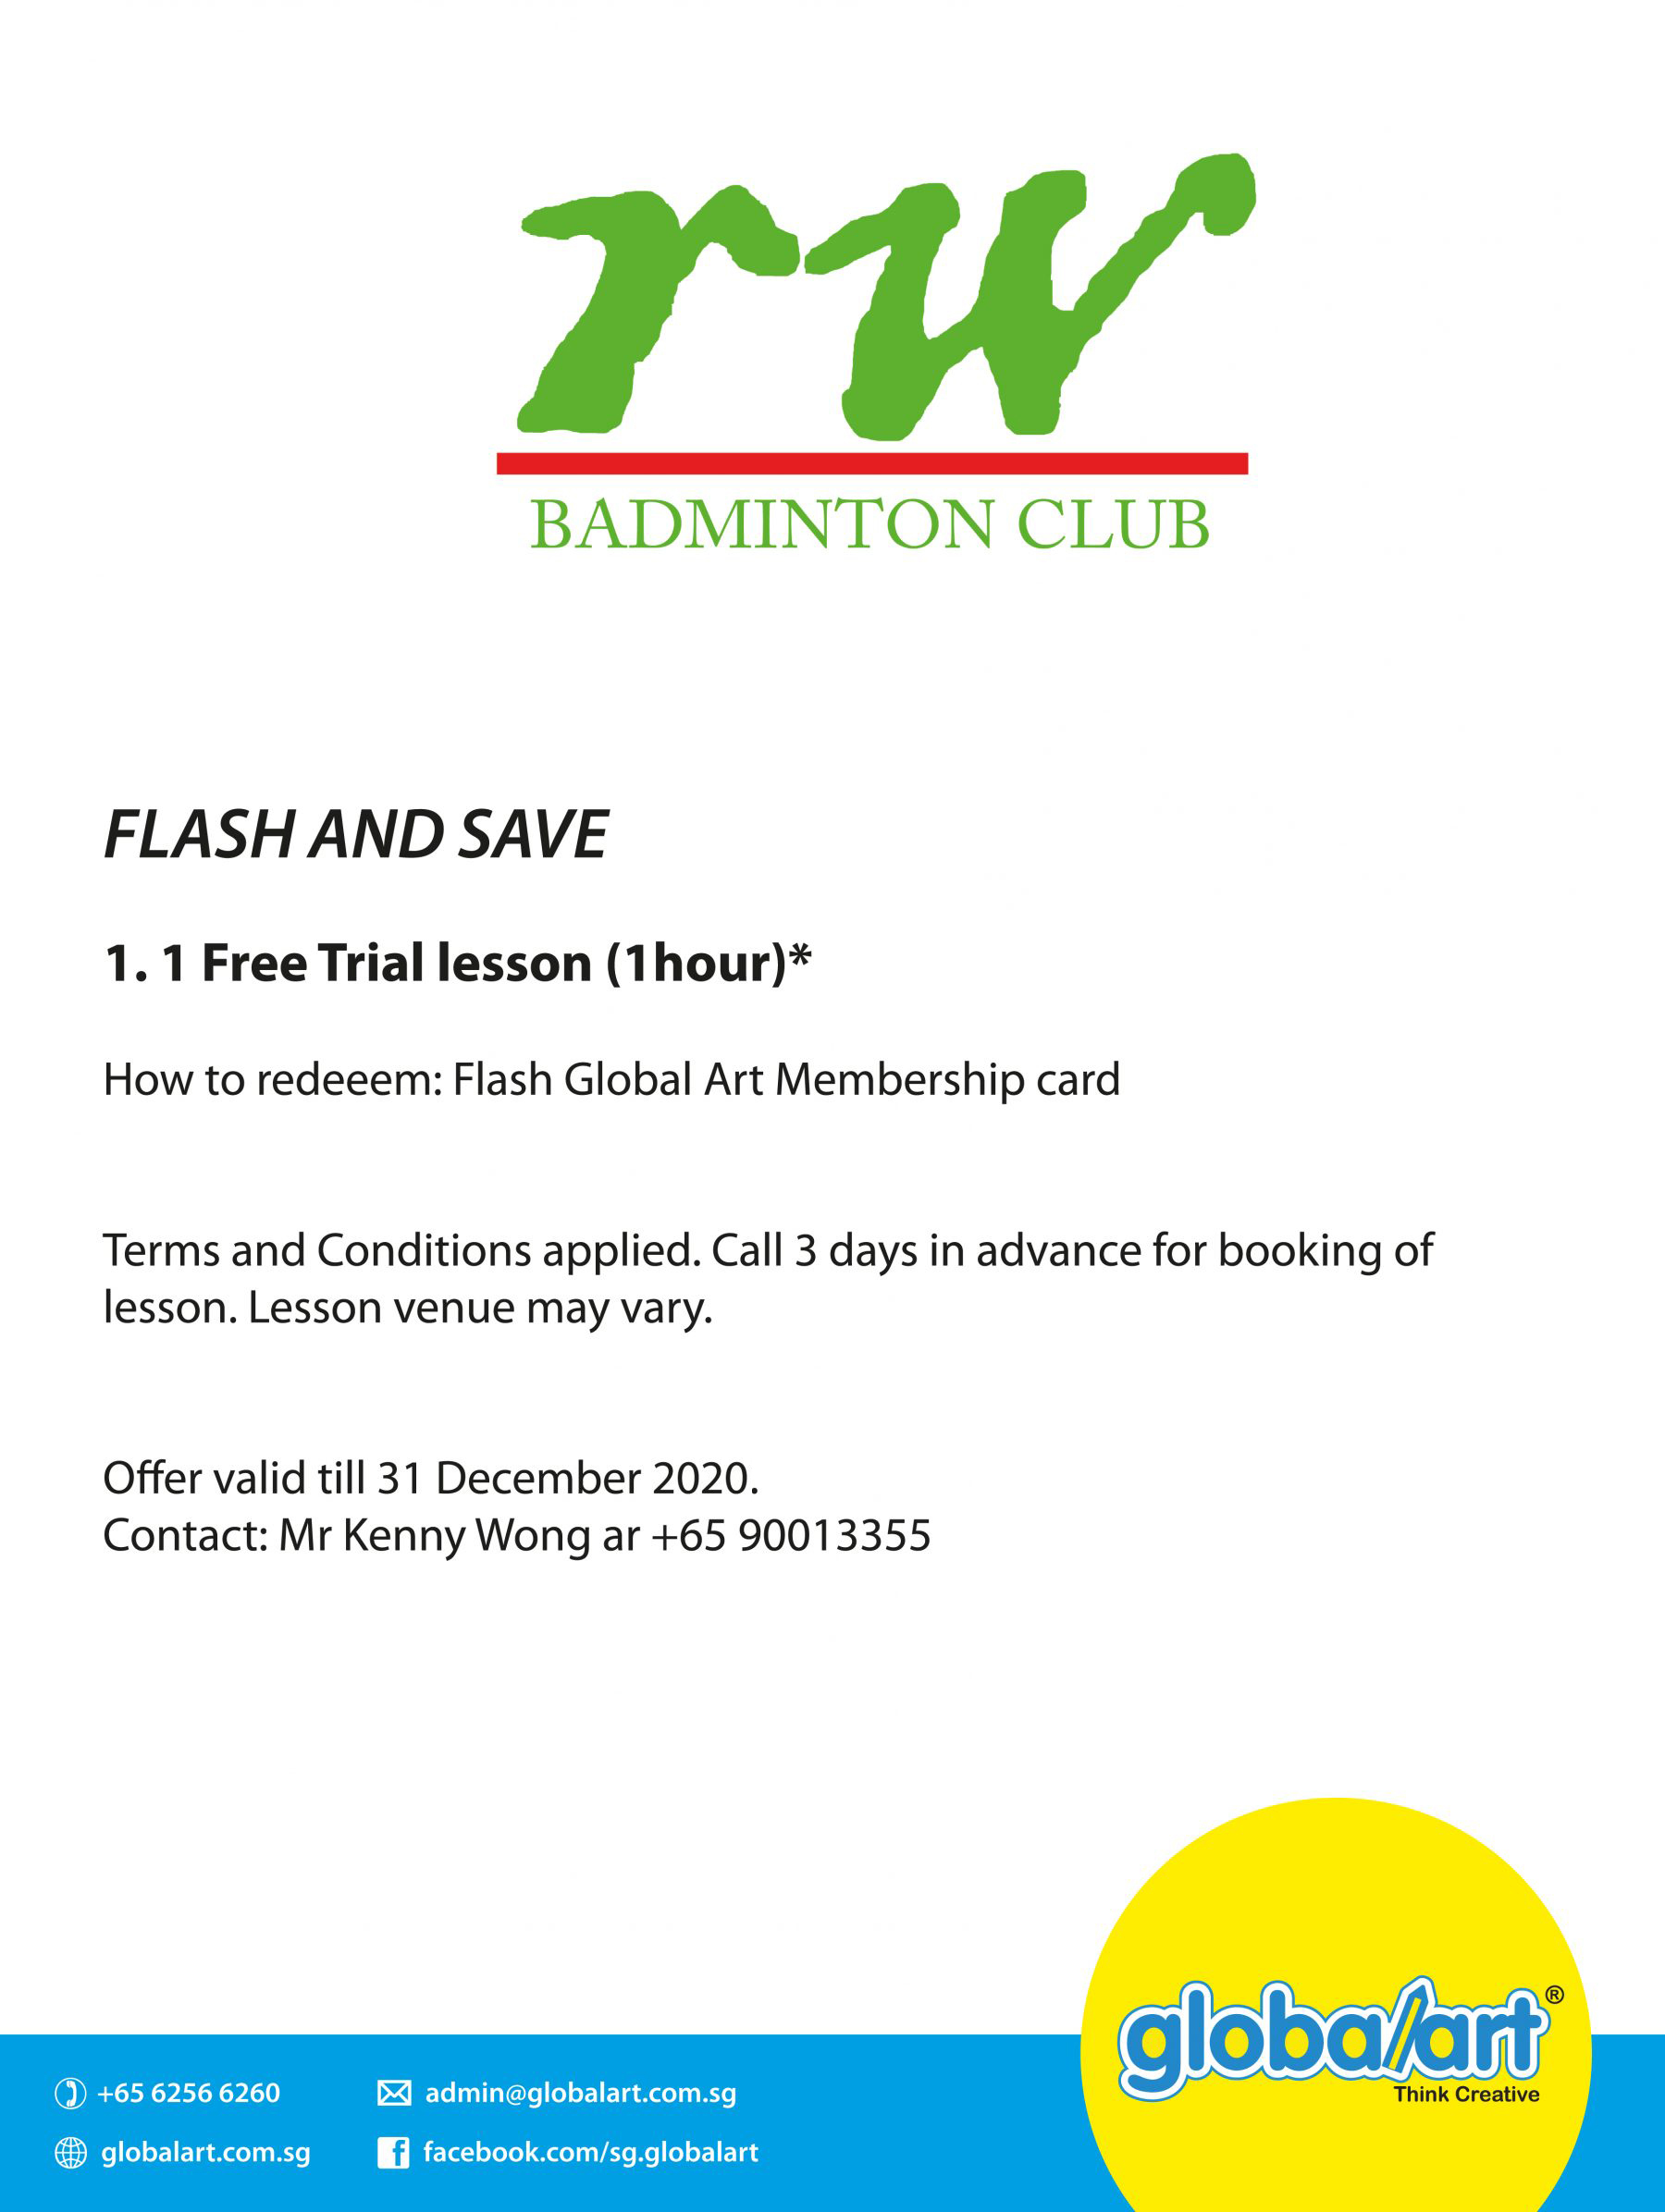 RW-badminton-club-1800x2392 2020